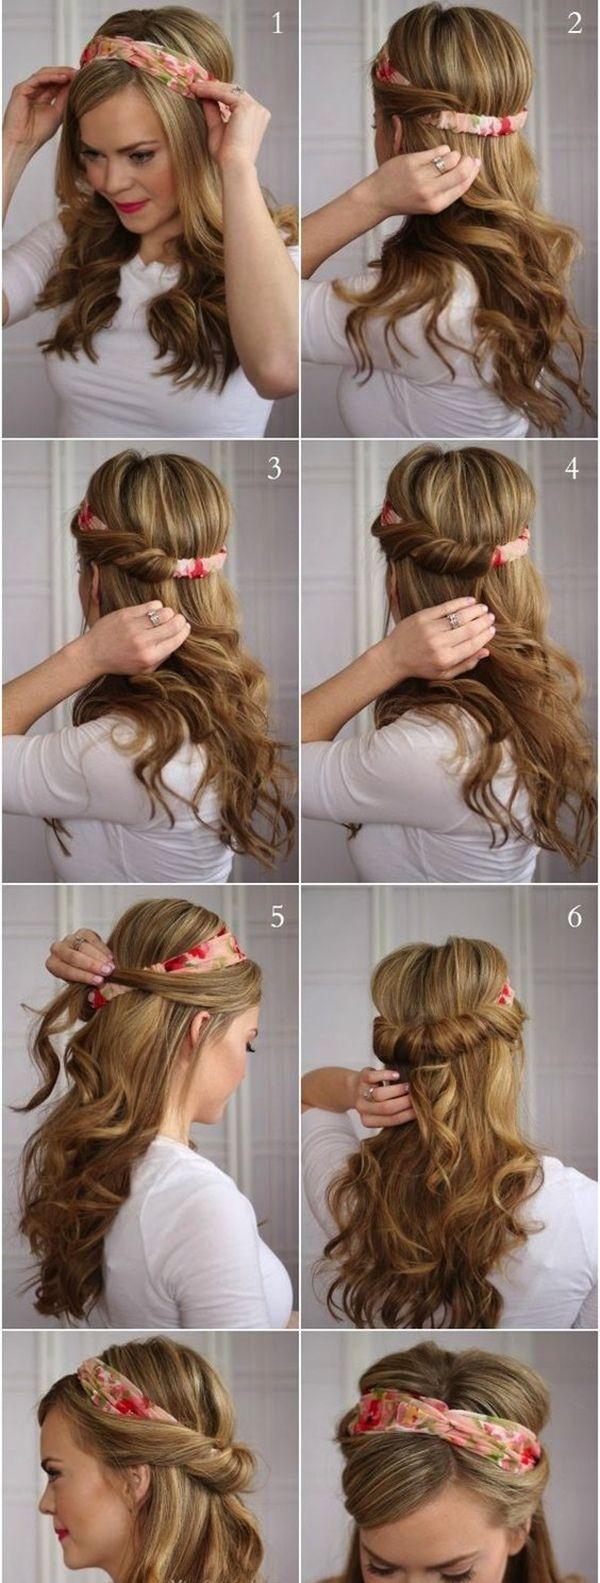 Rapidefacileretourécoleàcoiffurelongcheveux hair in